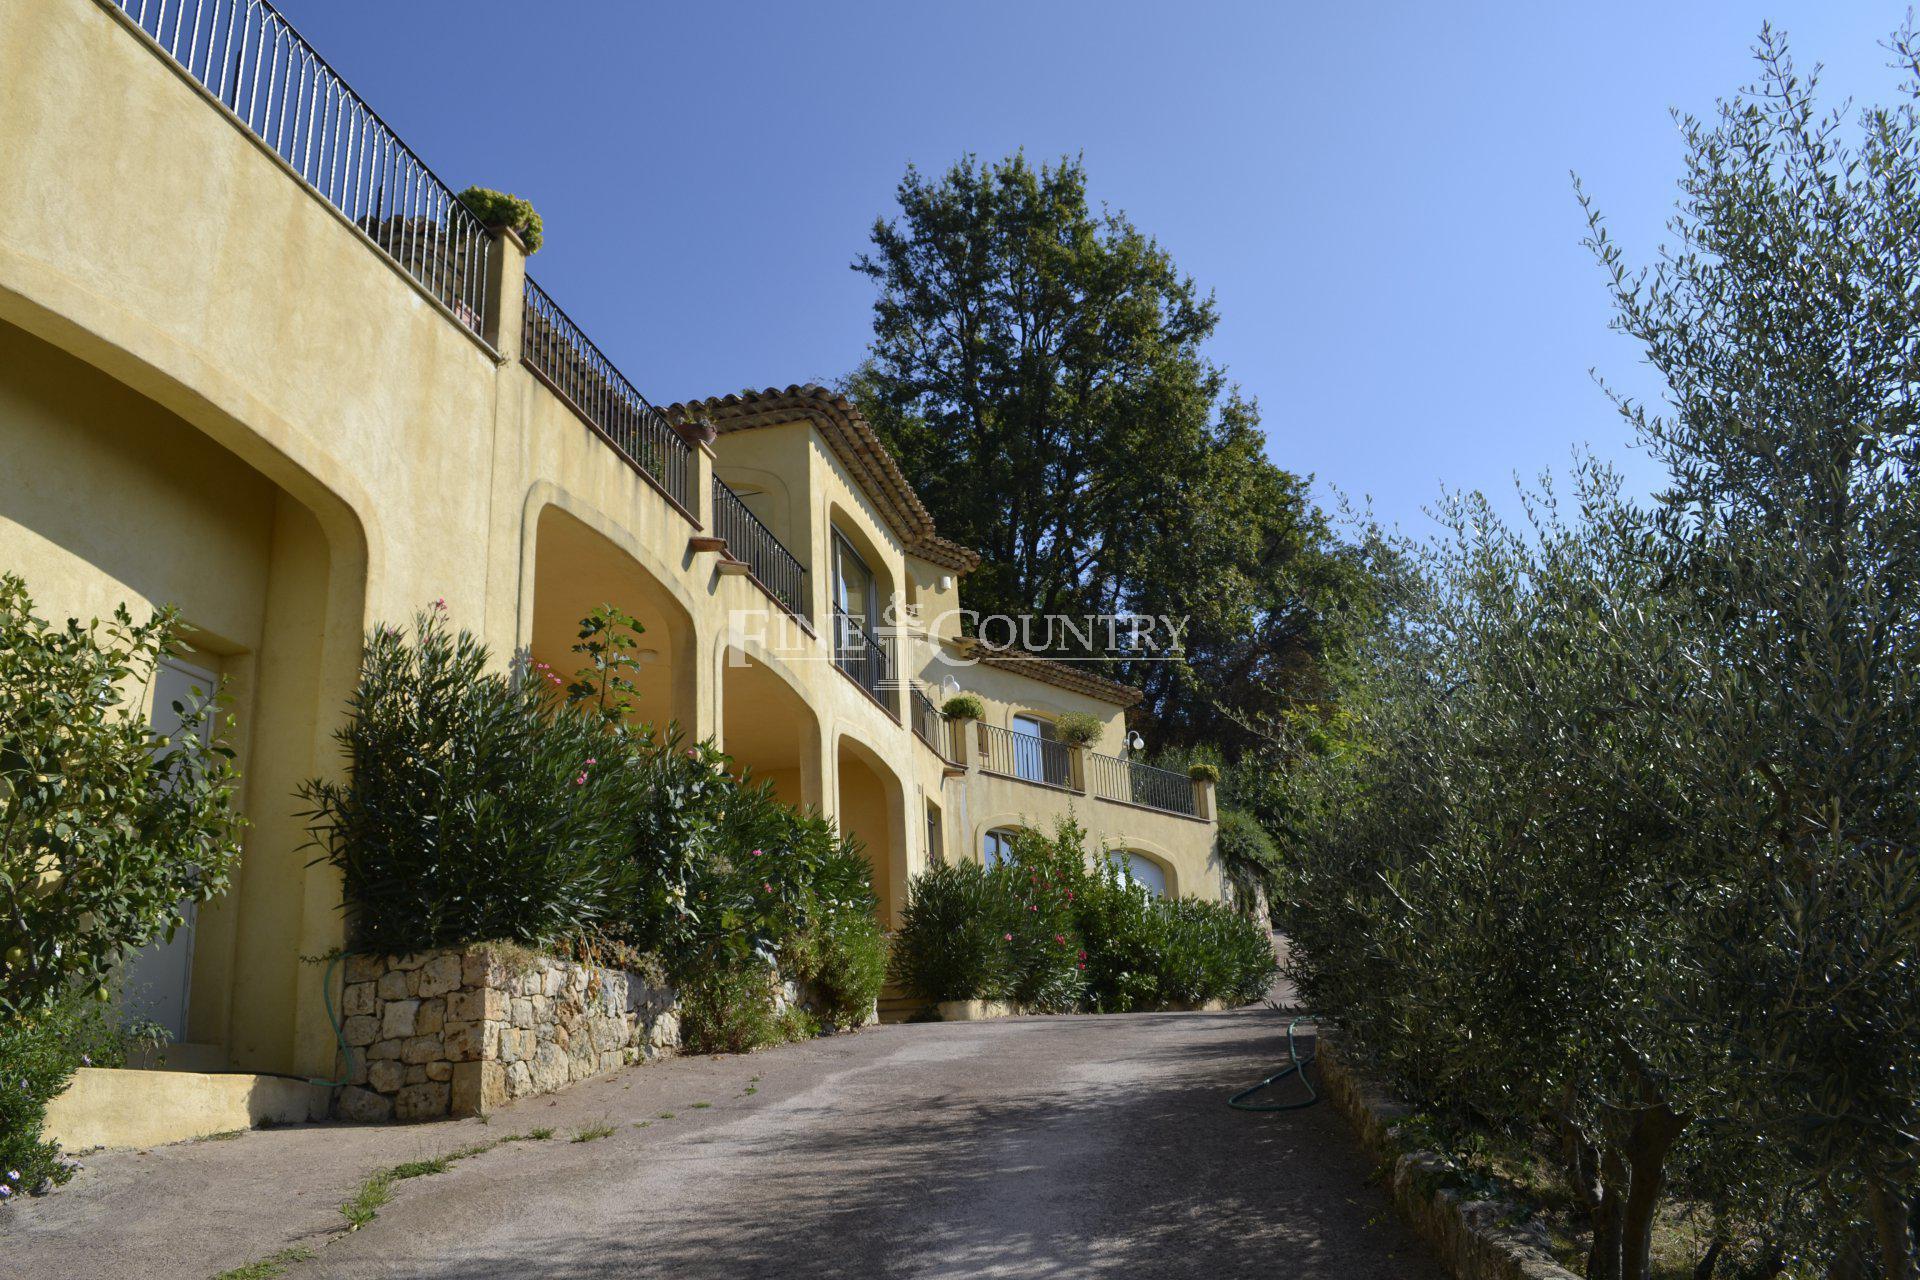 Villa, 296m2 total, 216m2 living space